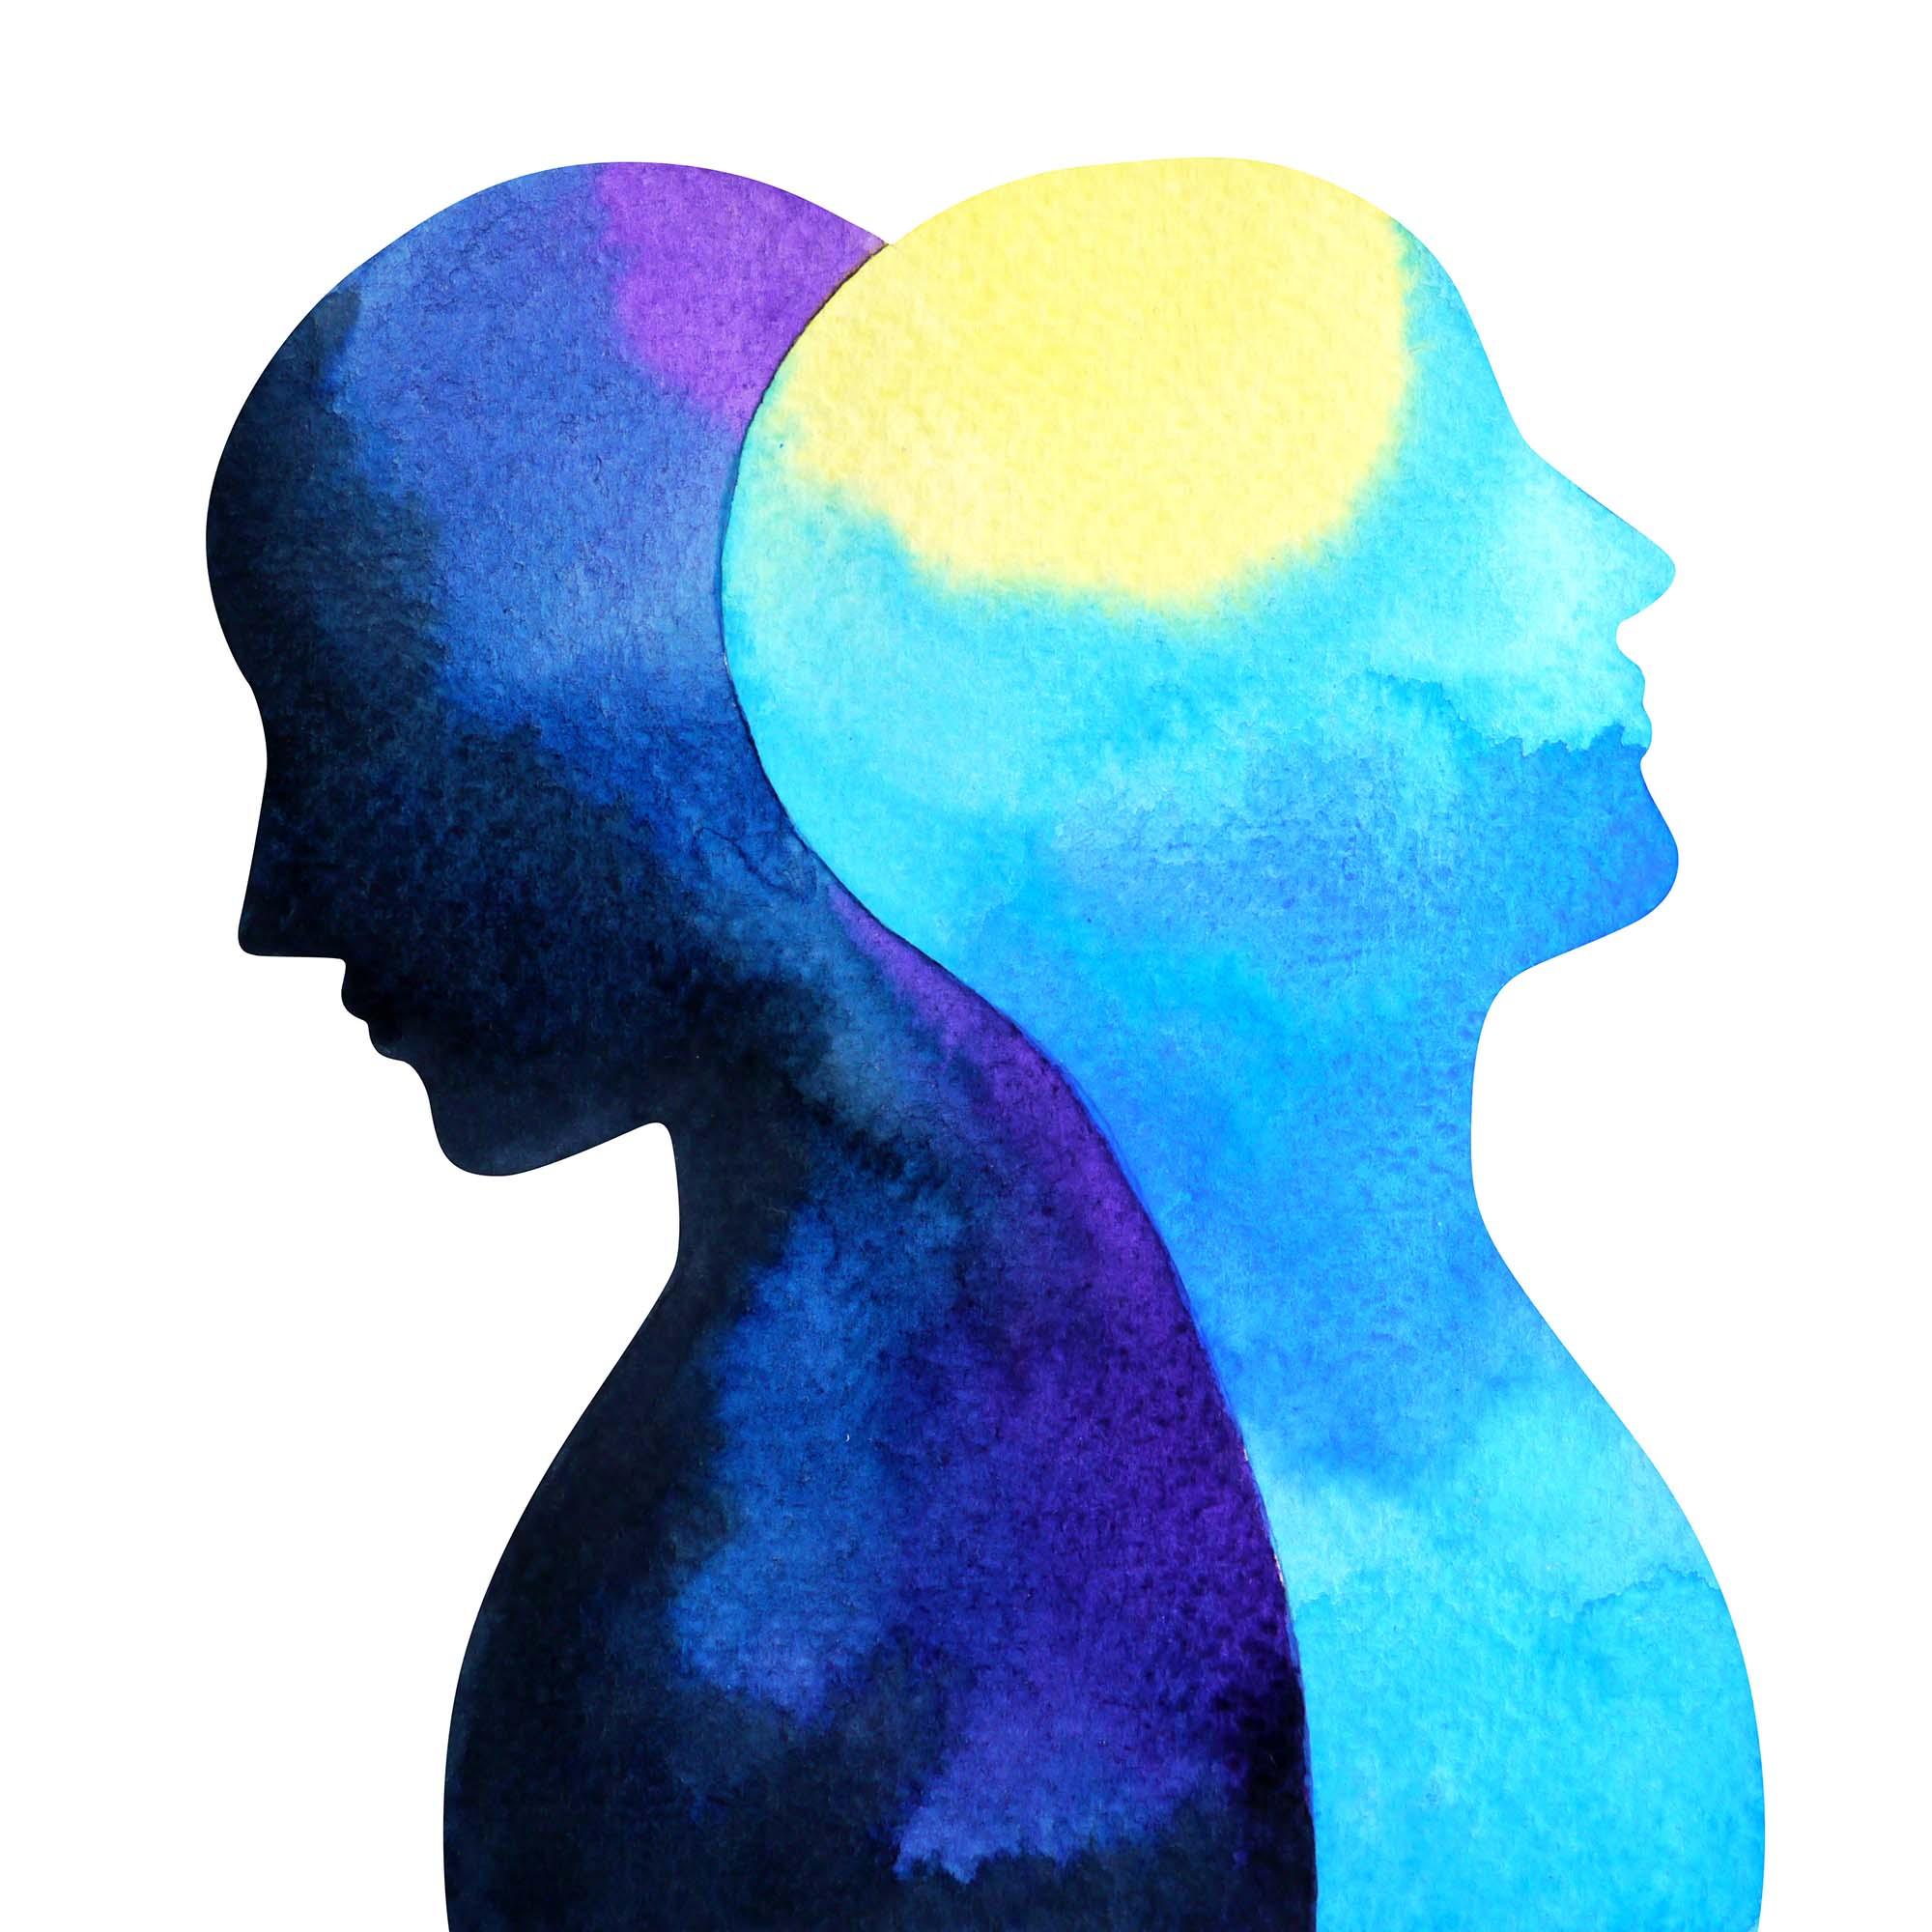 Watercolor painting depicting Bipolar Disorder